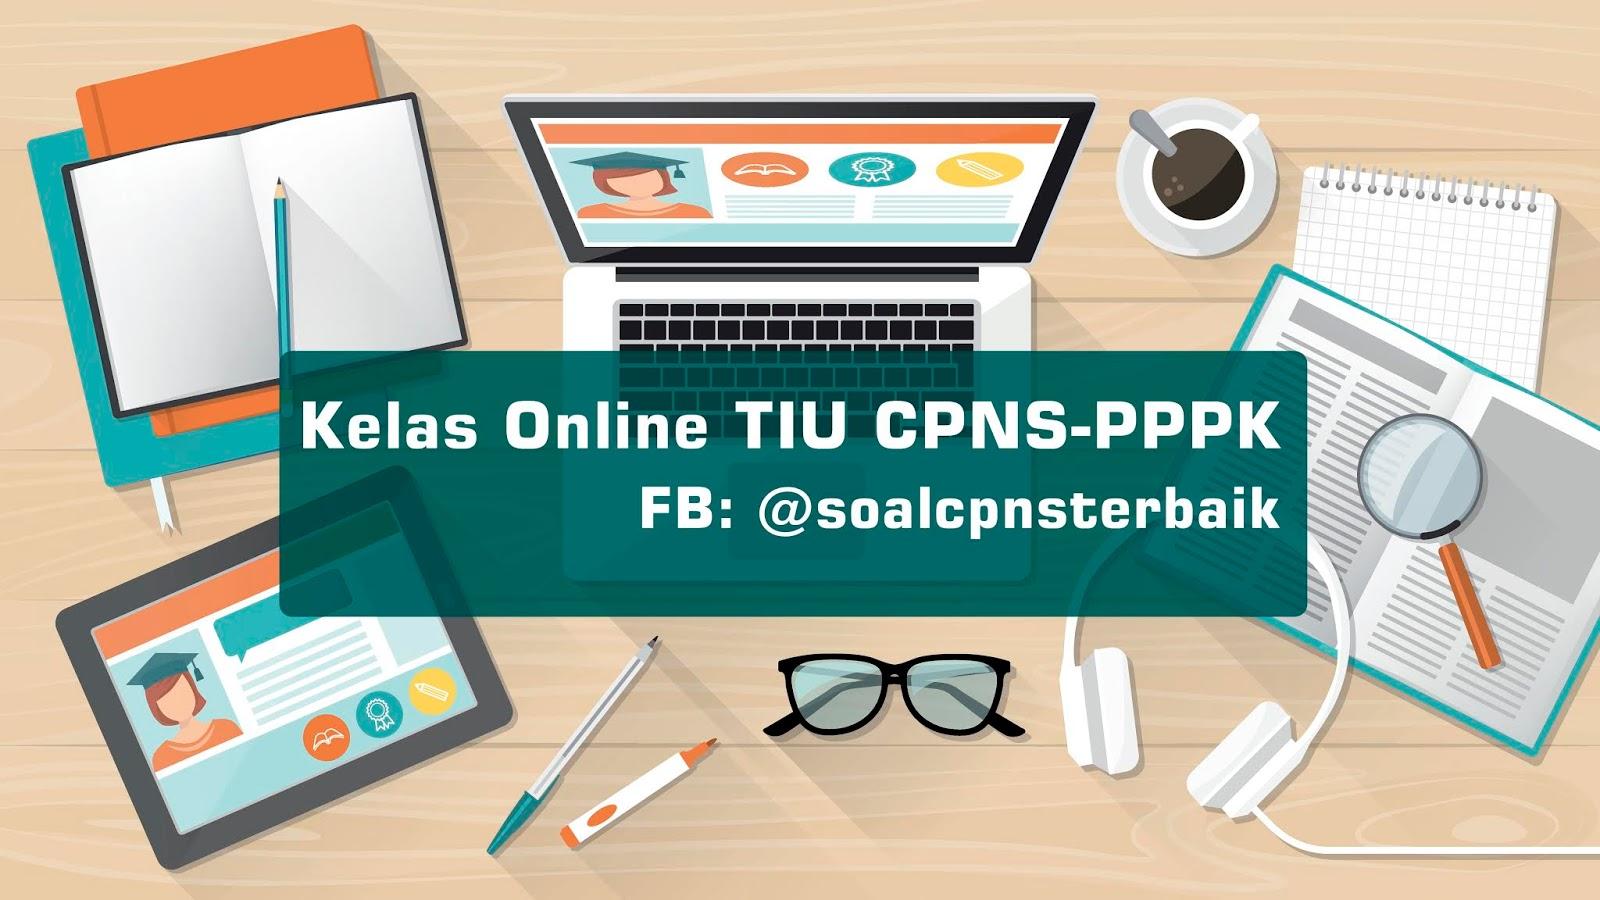 Kelas Online TIU CPNS